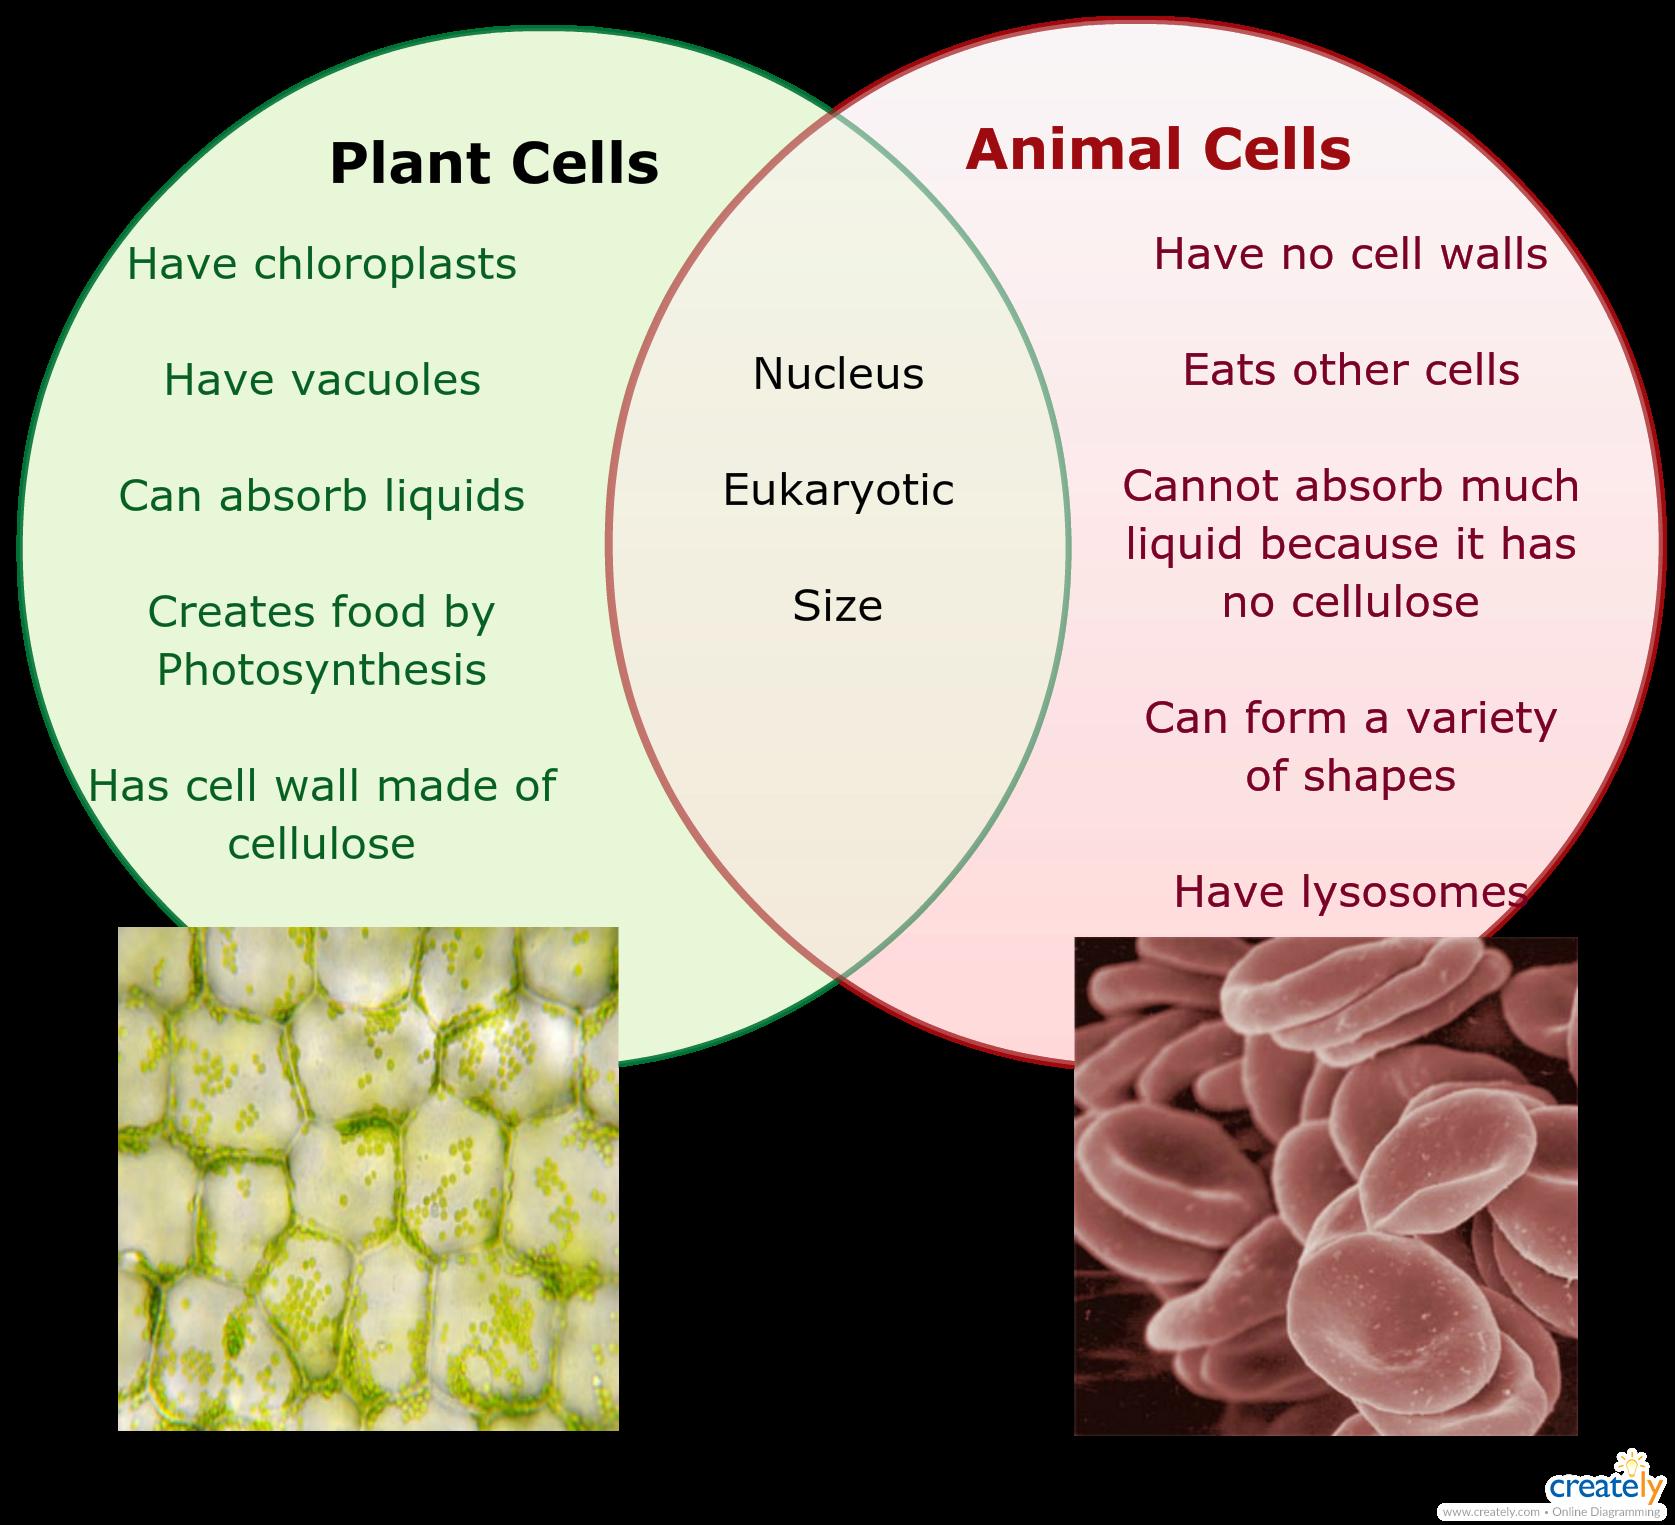 plant vs animal cells venn diagram for educational purposes venn diagram [ 1675 x 1525 Pixel ]